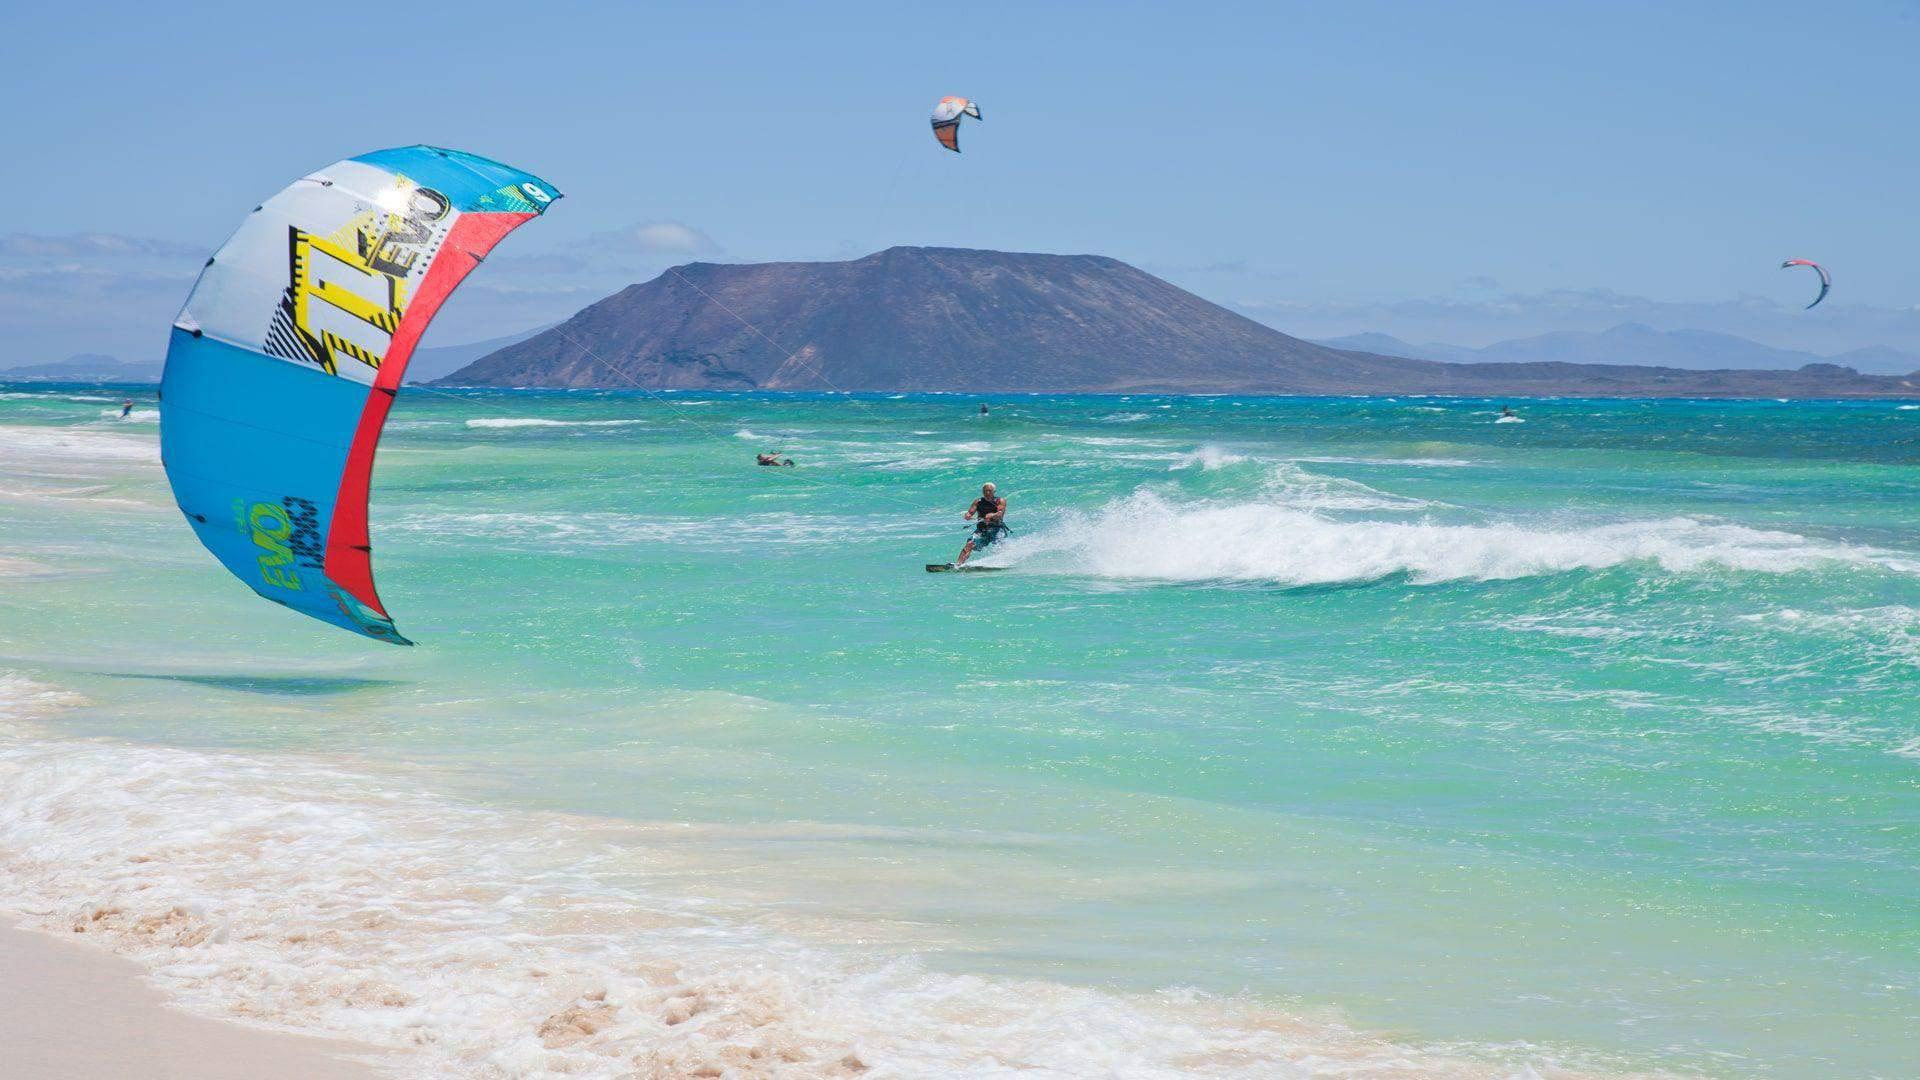 Kipras – idealus vandens sporto mėgėjams